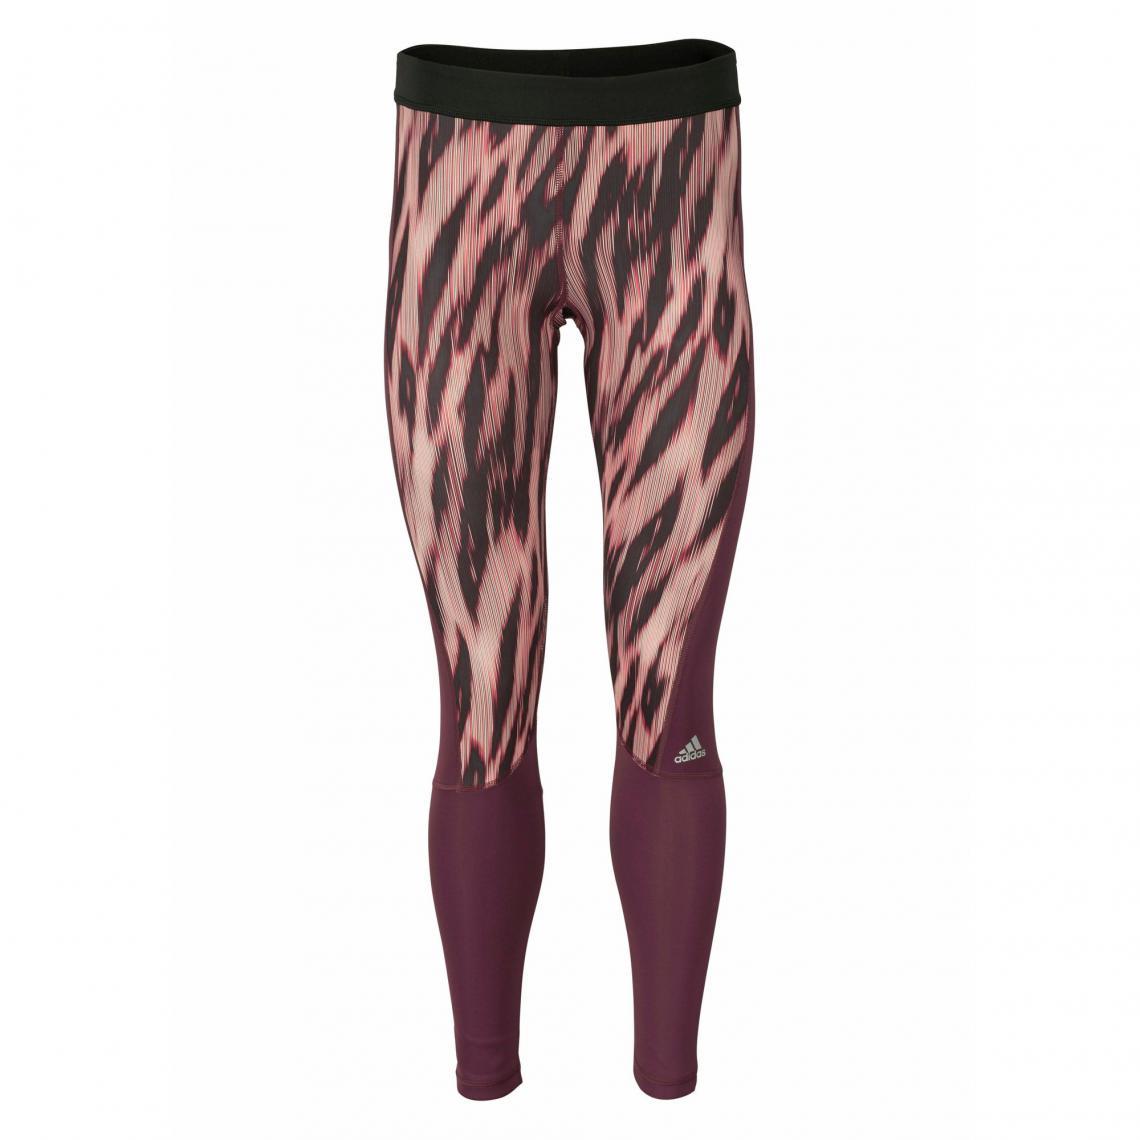 Legging de sport imprimé femme Climalite® TechFit® adidas Performance -  Rouge Adidas Performance 29f3dddd421